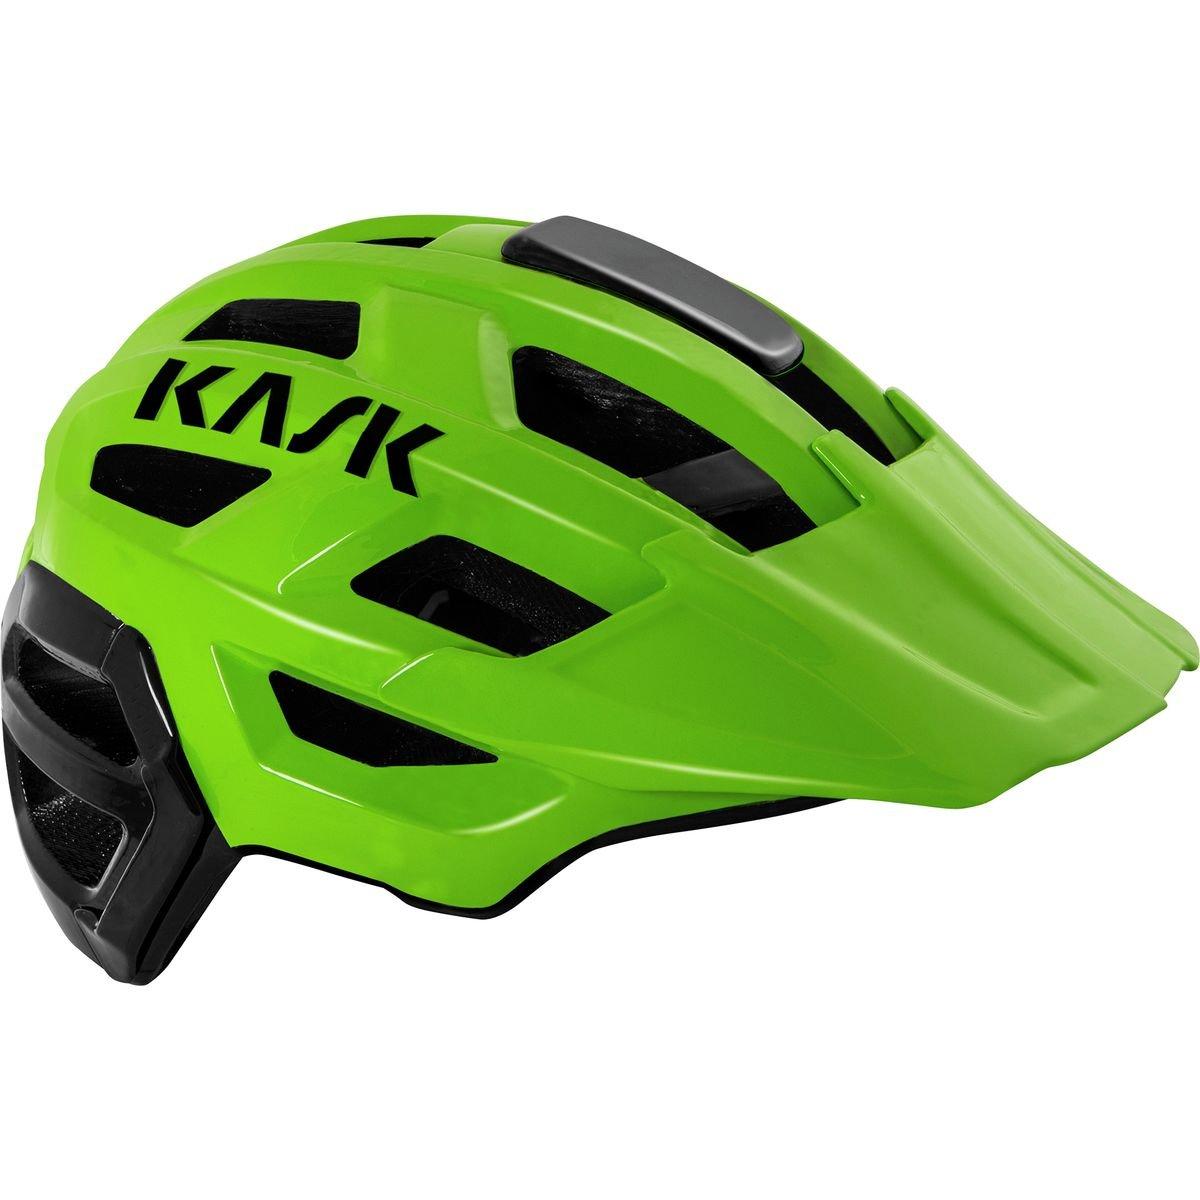 Kask Rex Helmet, Lime, Large